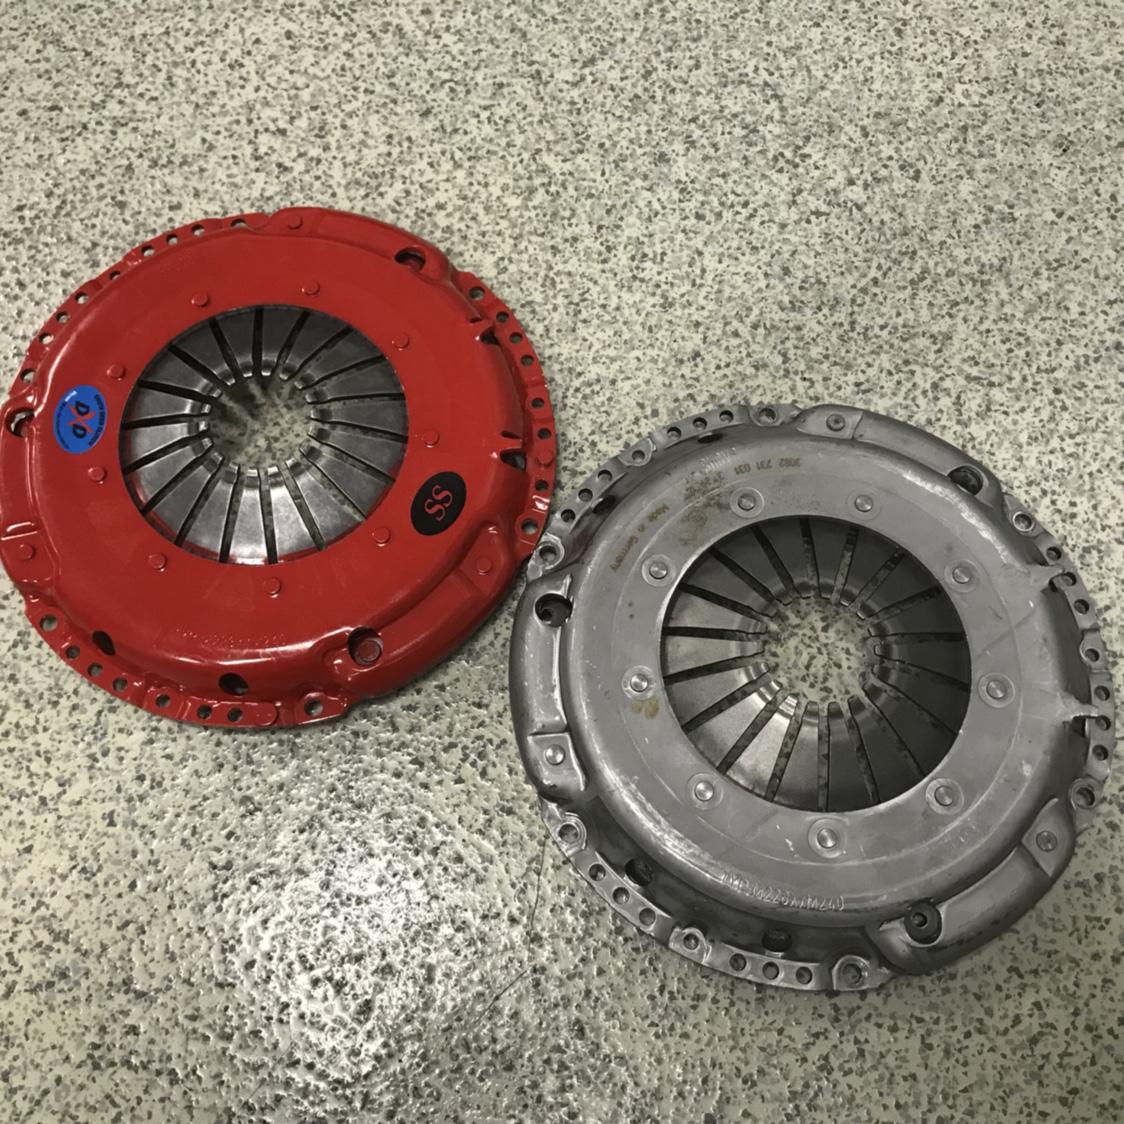 3 6 Vr6 – engine